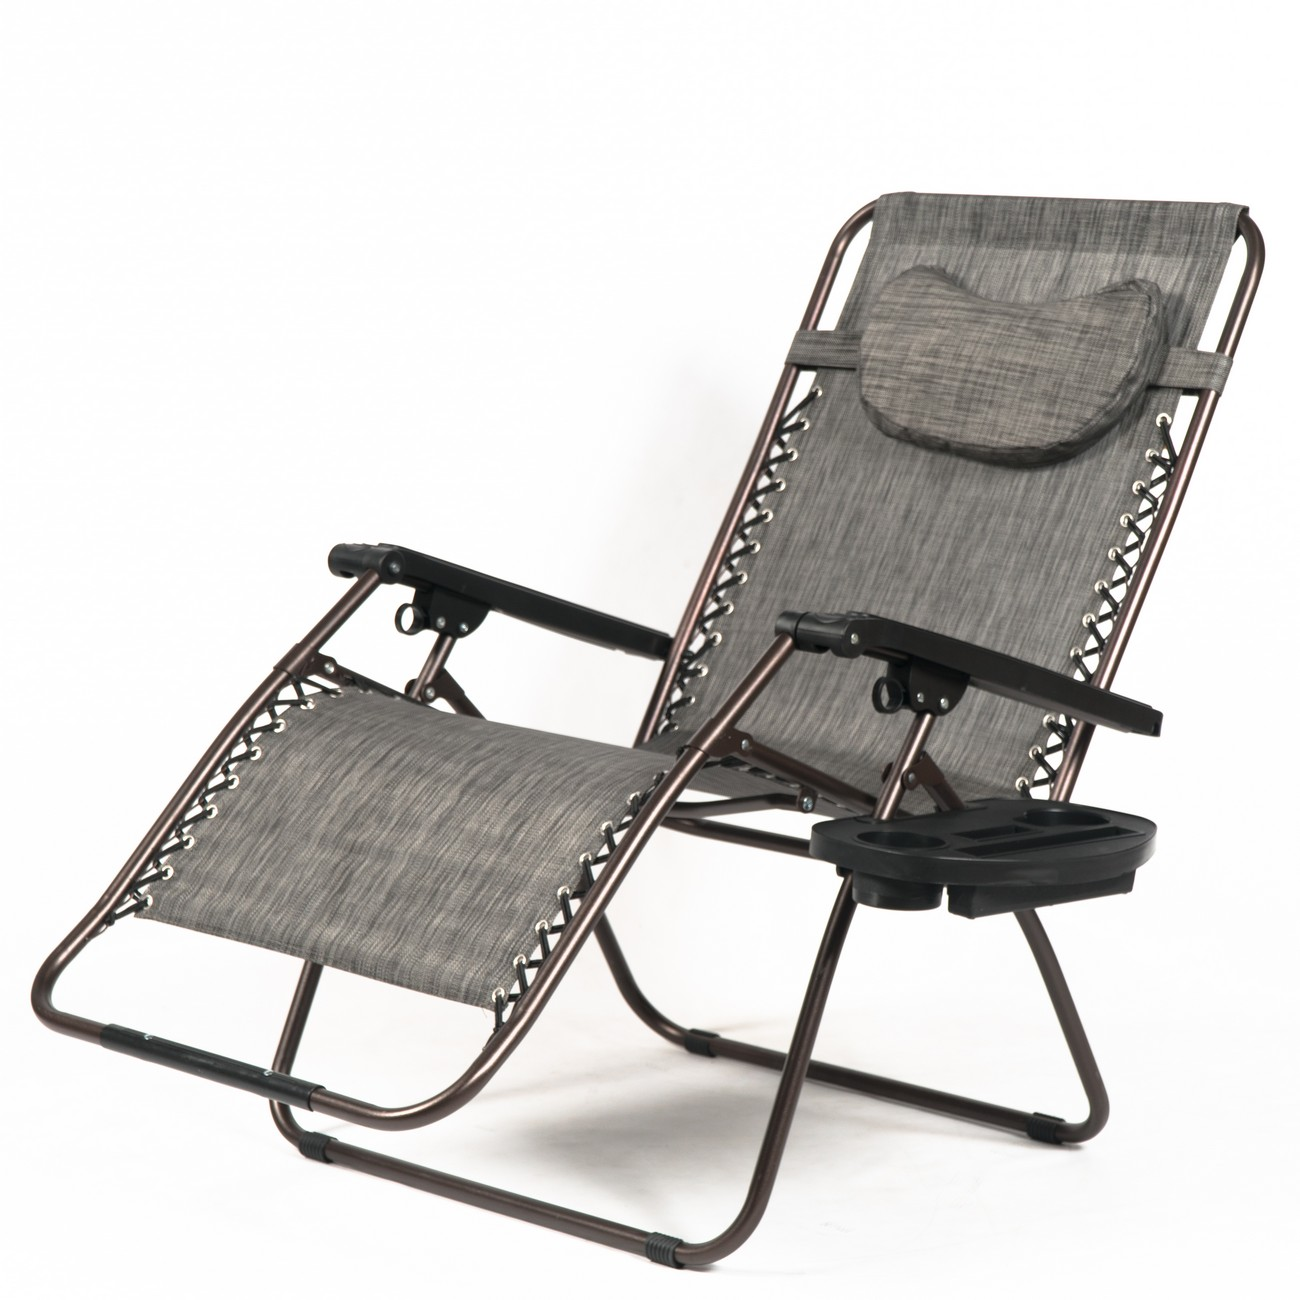 NEW Set of (2) Zero Gravity Chair XL Oversize Chairs